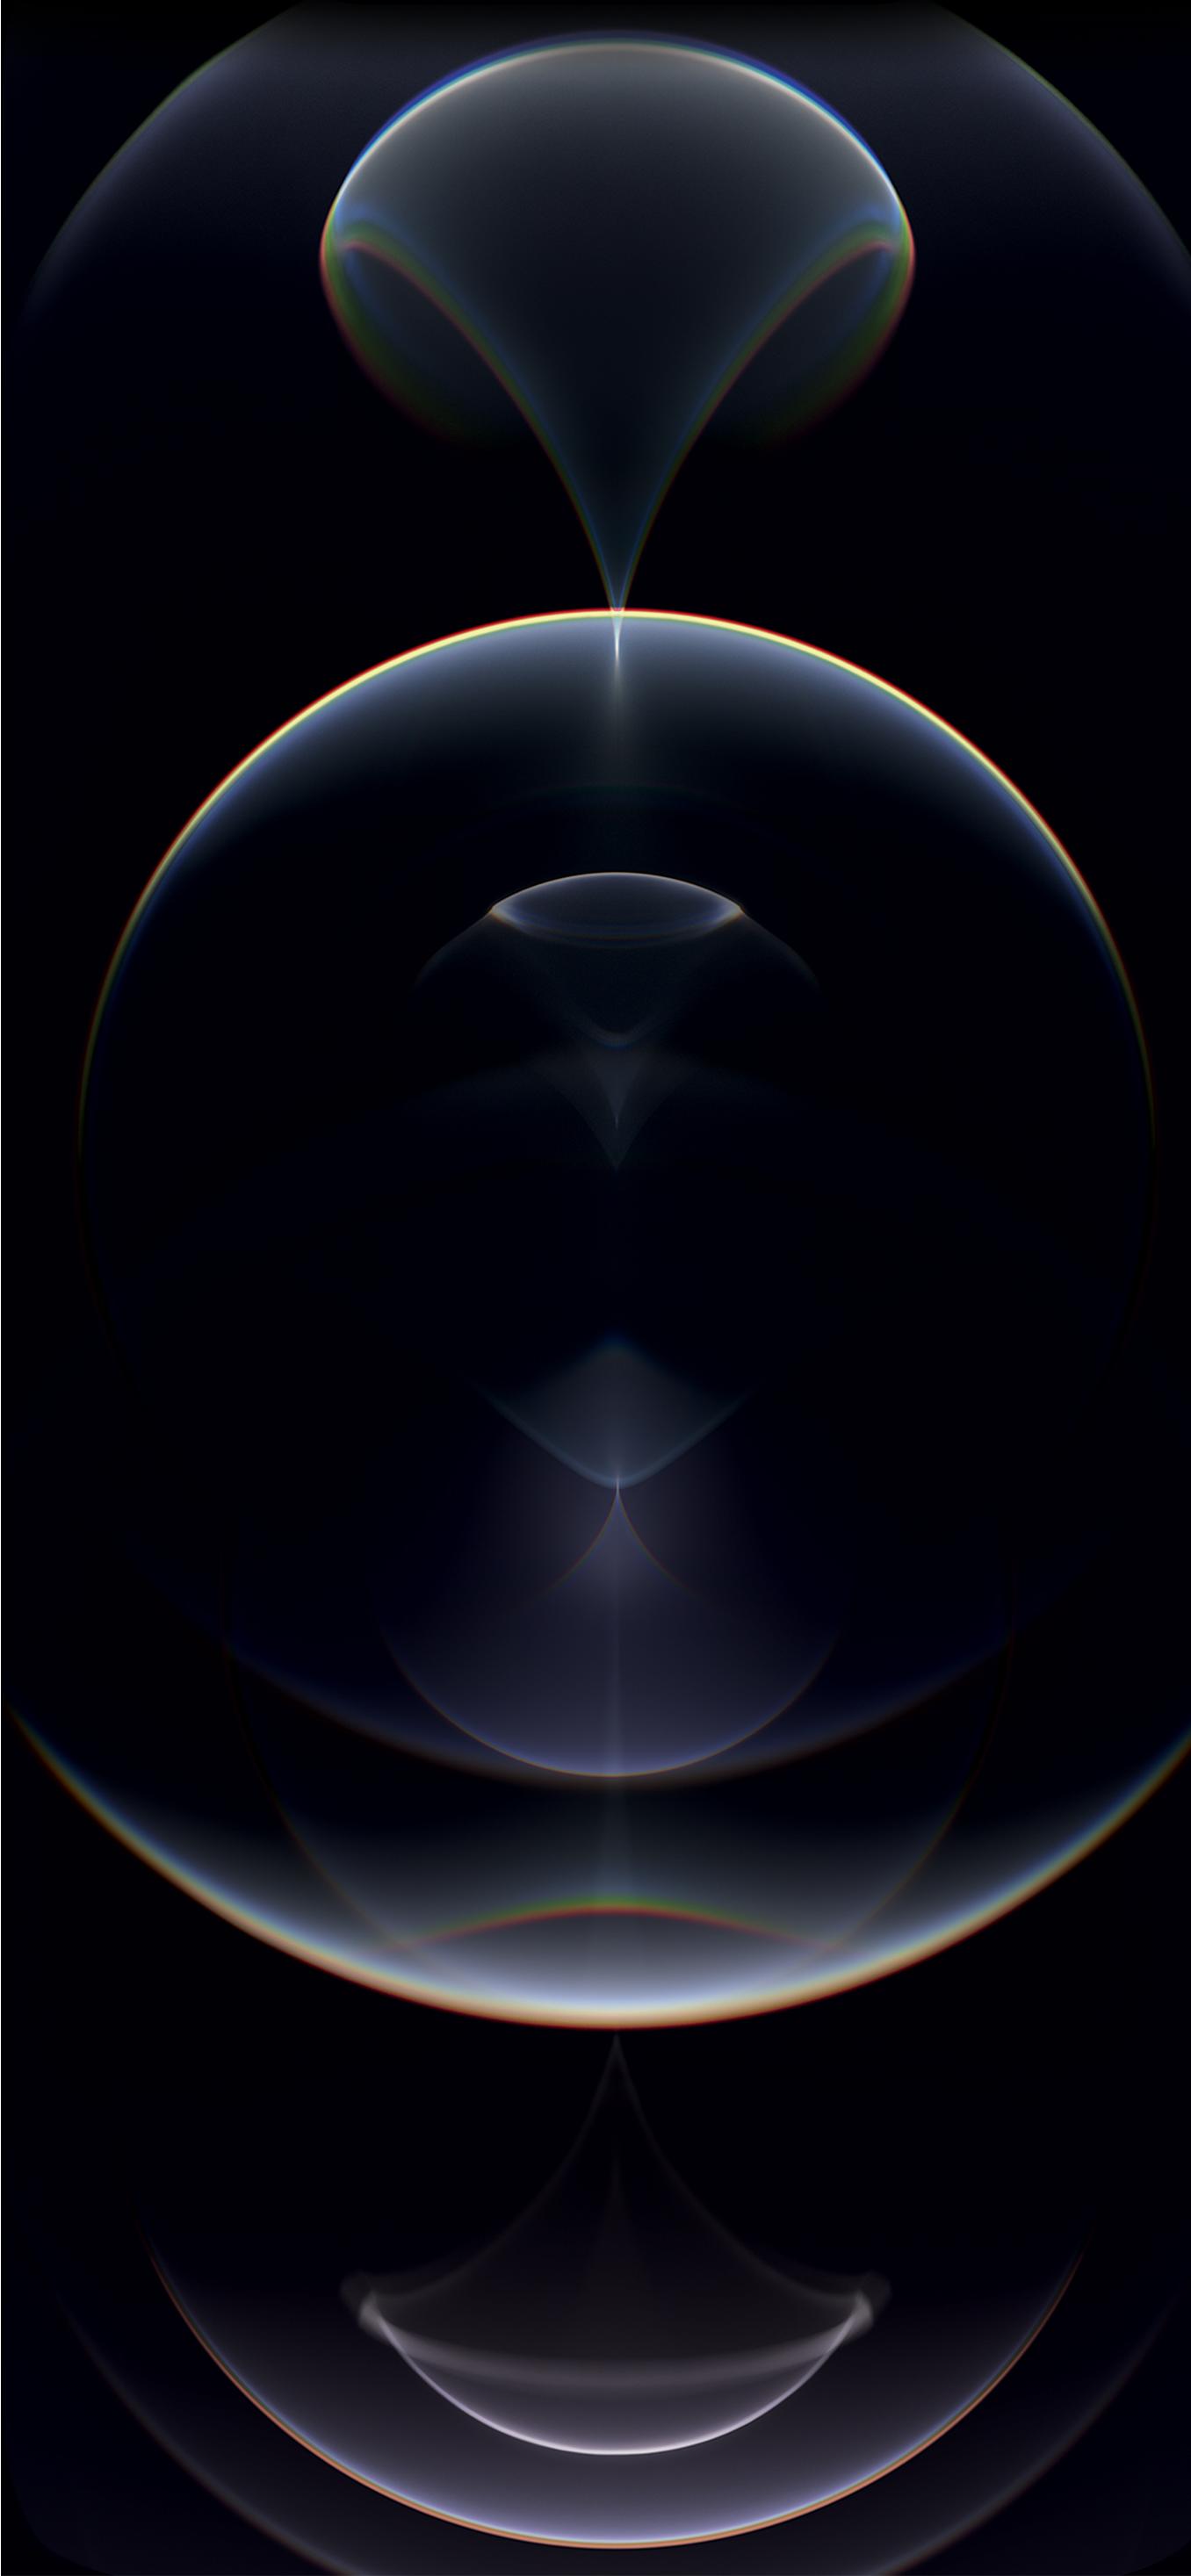 Iphone Wallpaper 2020